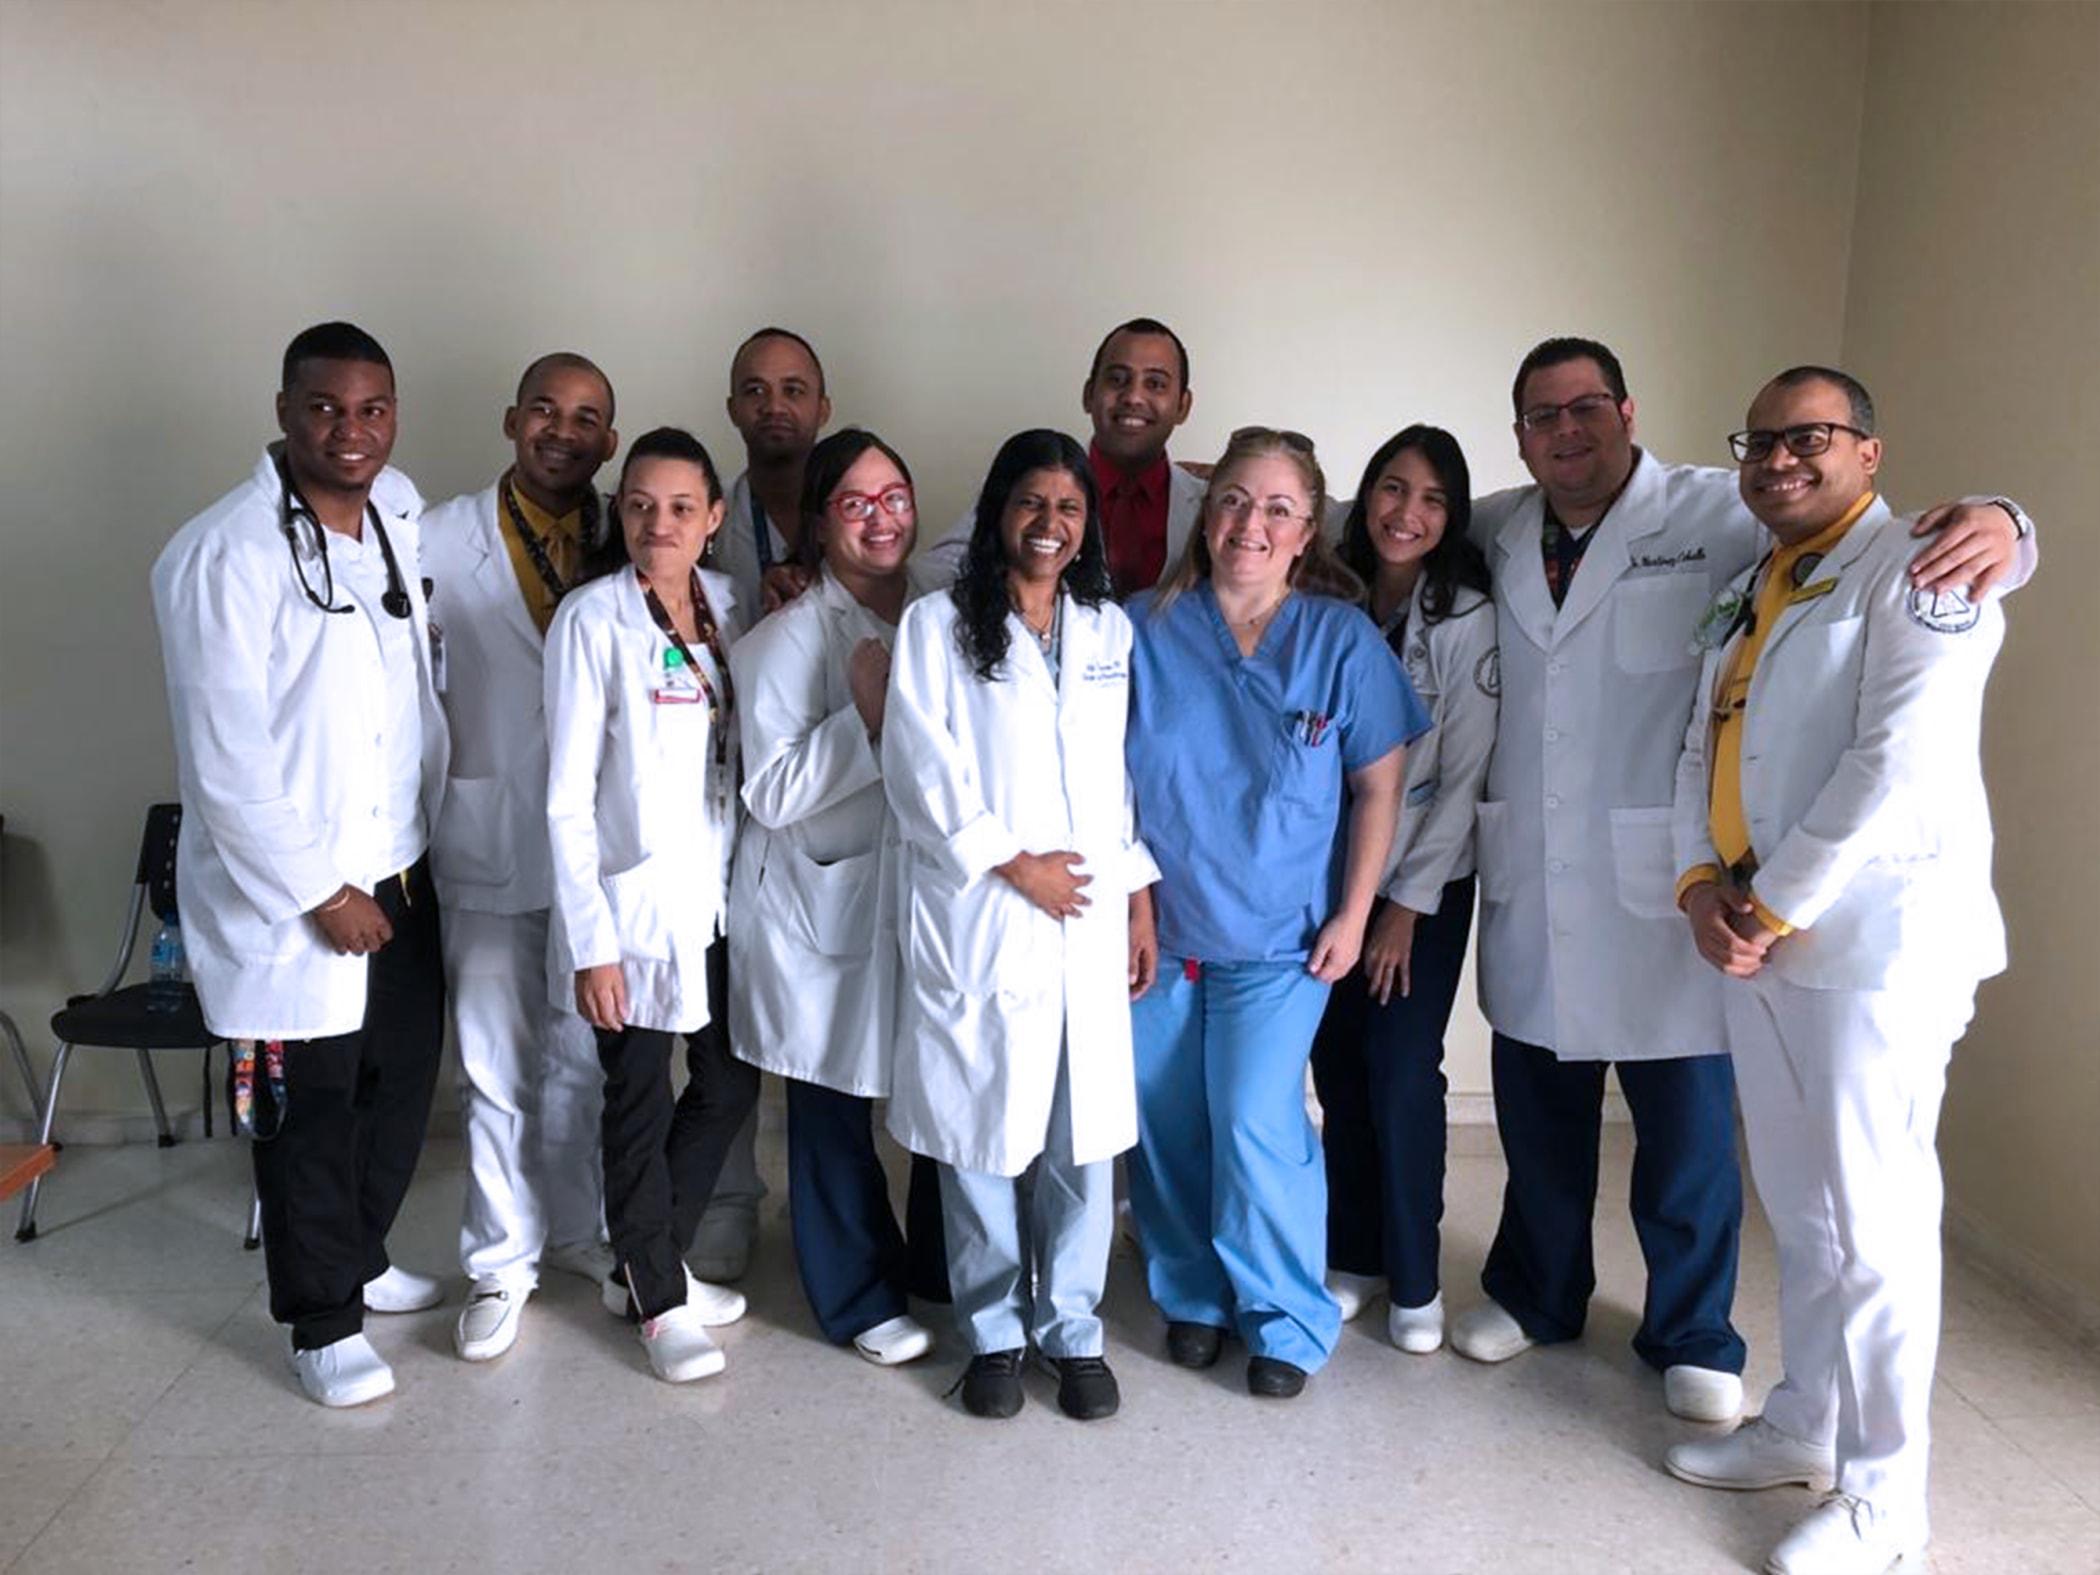 Urogynecology Global Health Initiative (UGHI) Dominican Republic Nov 16-24, 2019